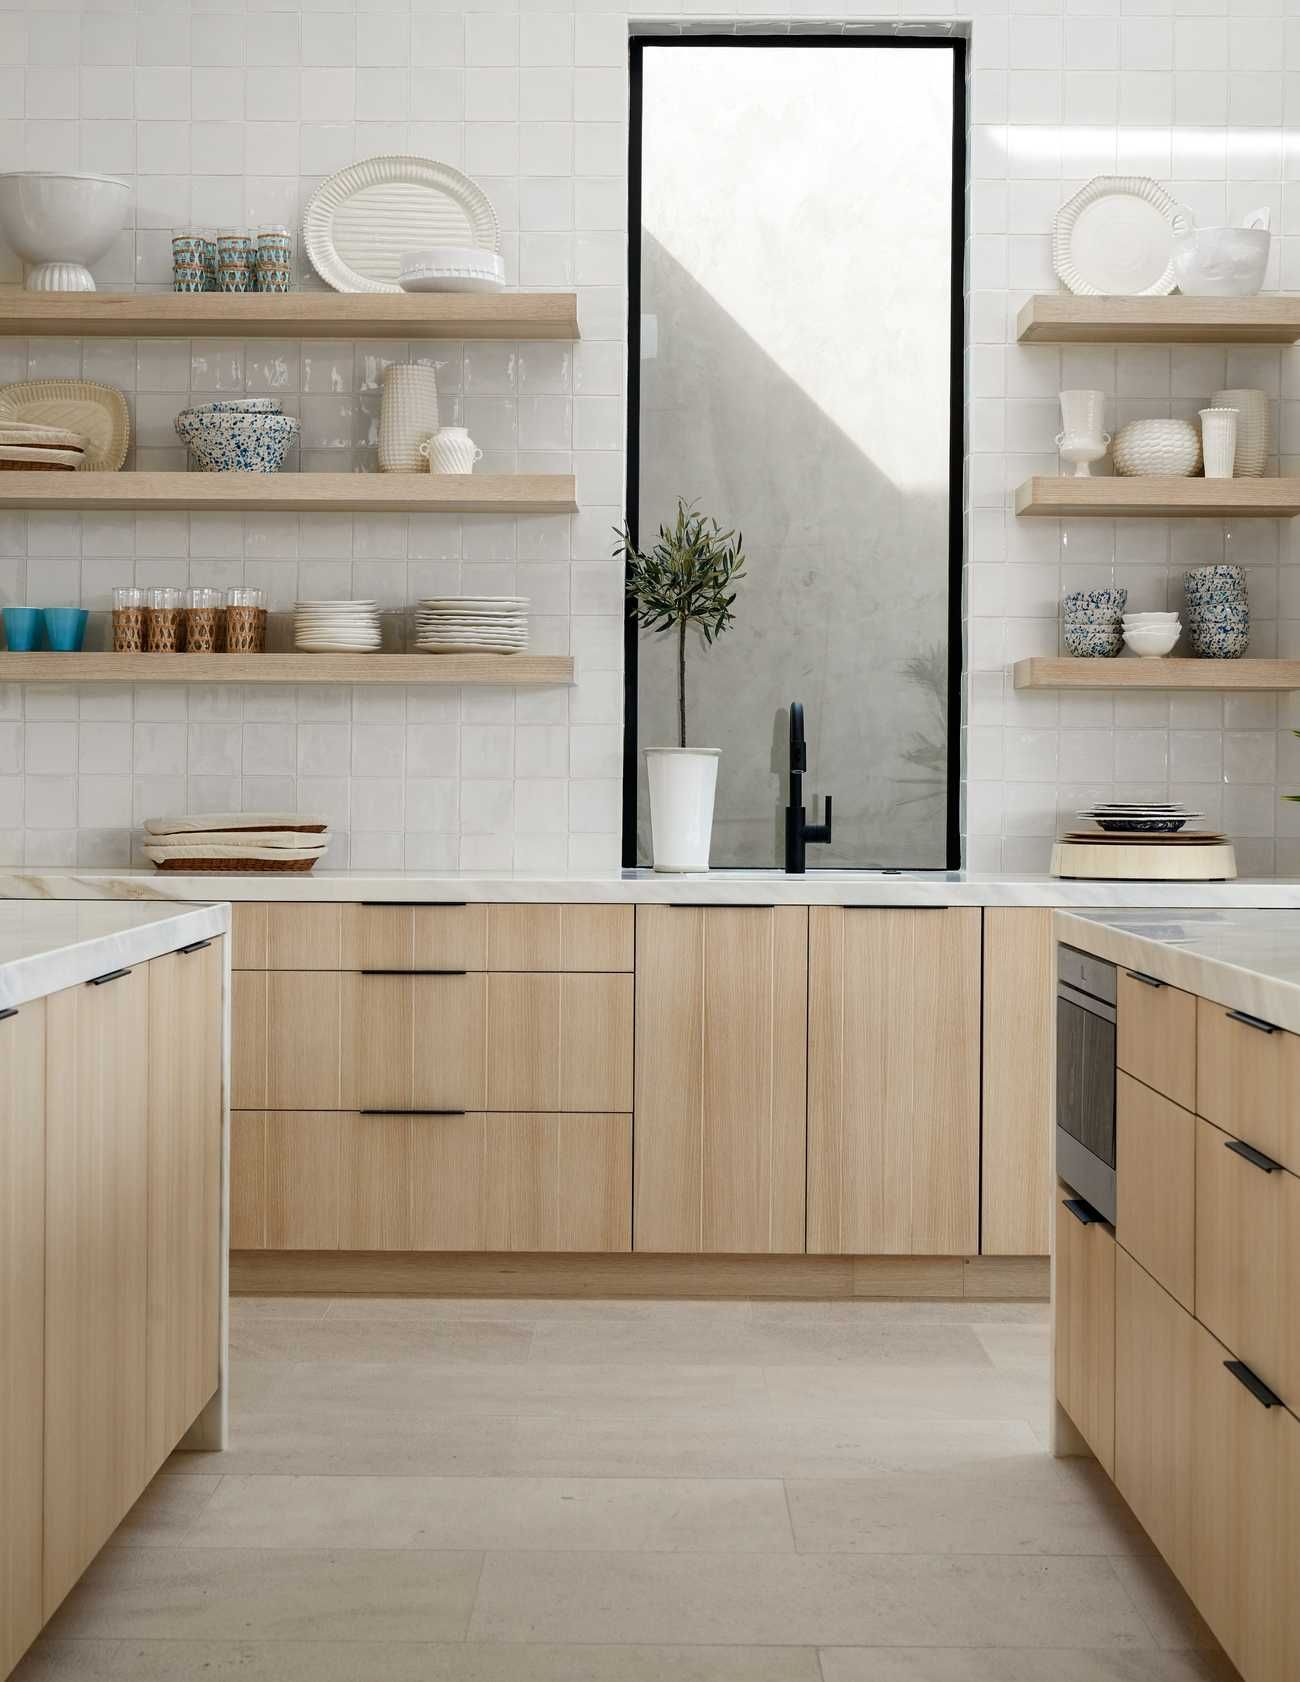 casa leggera part a... the great room and kitchen - Hillary Taylor Interiors #minimalkitchen